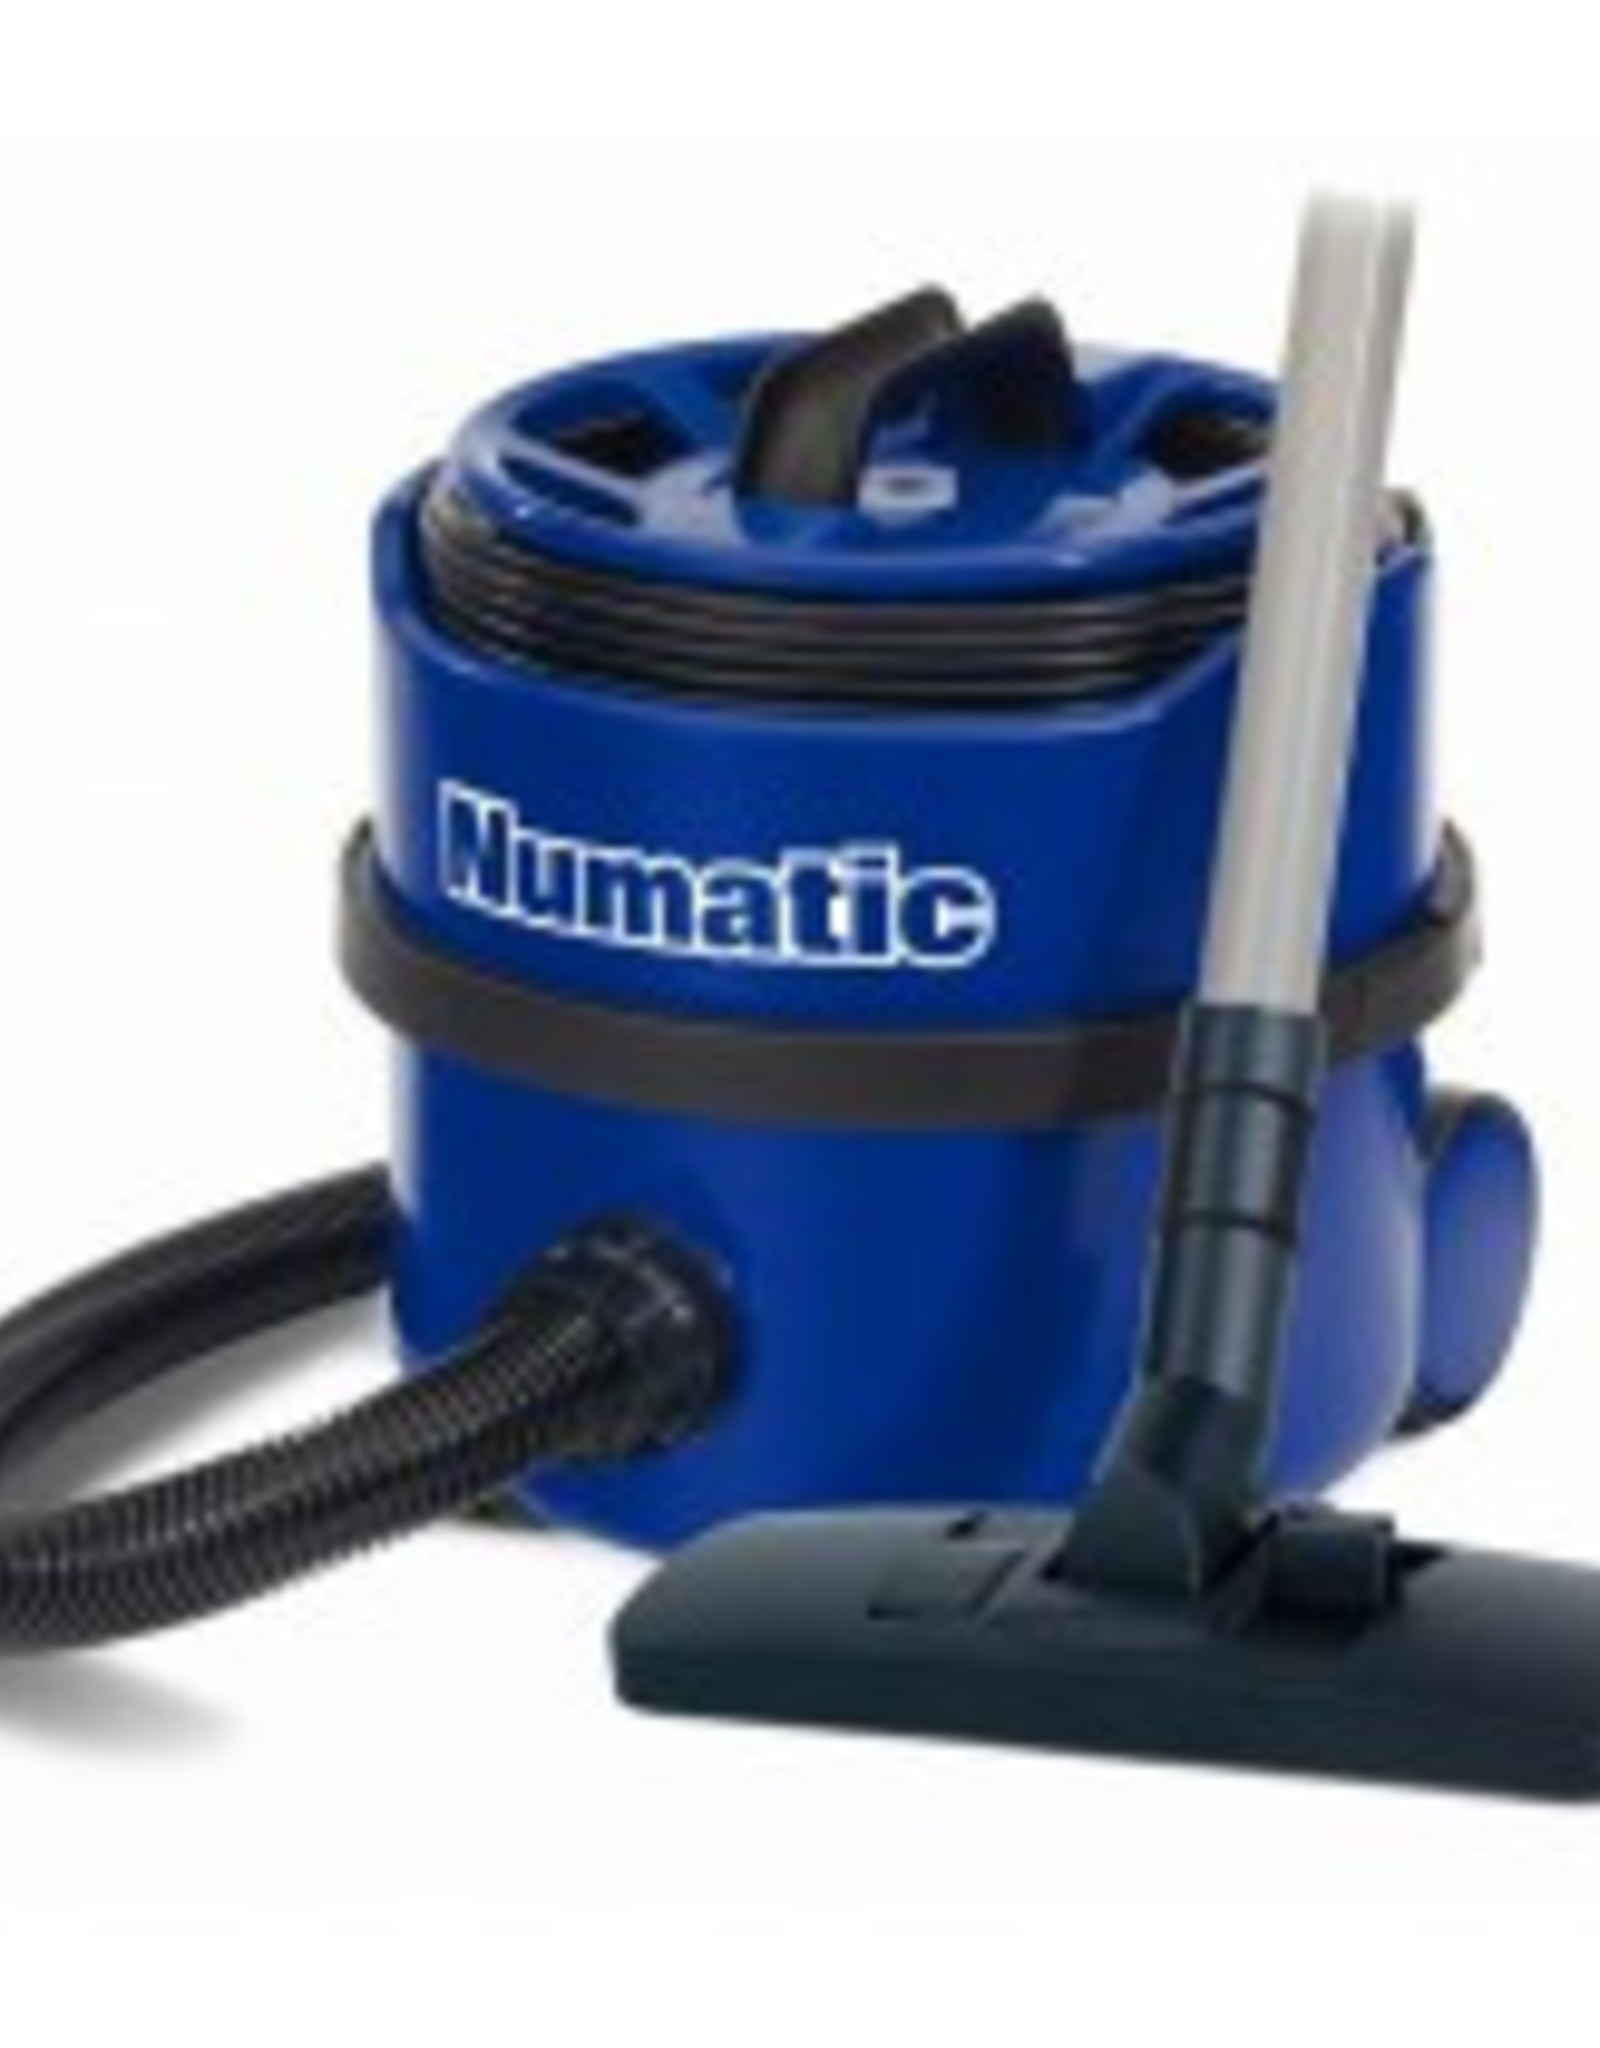 Numatic NVH-180 Kit AH3,  royal blue